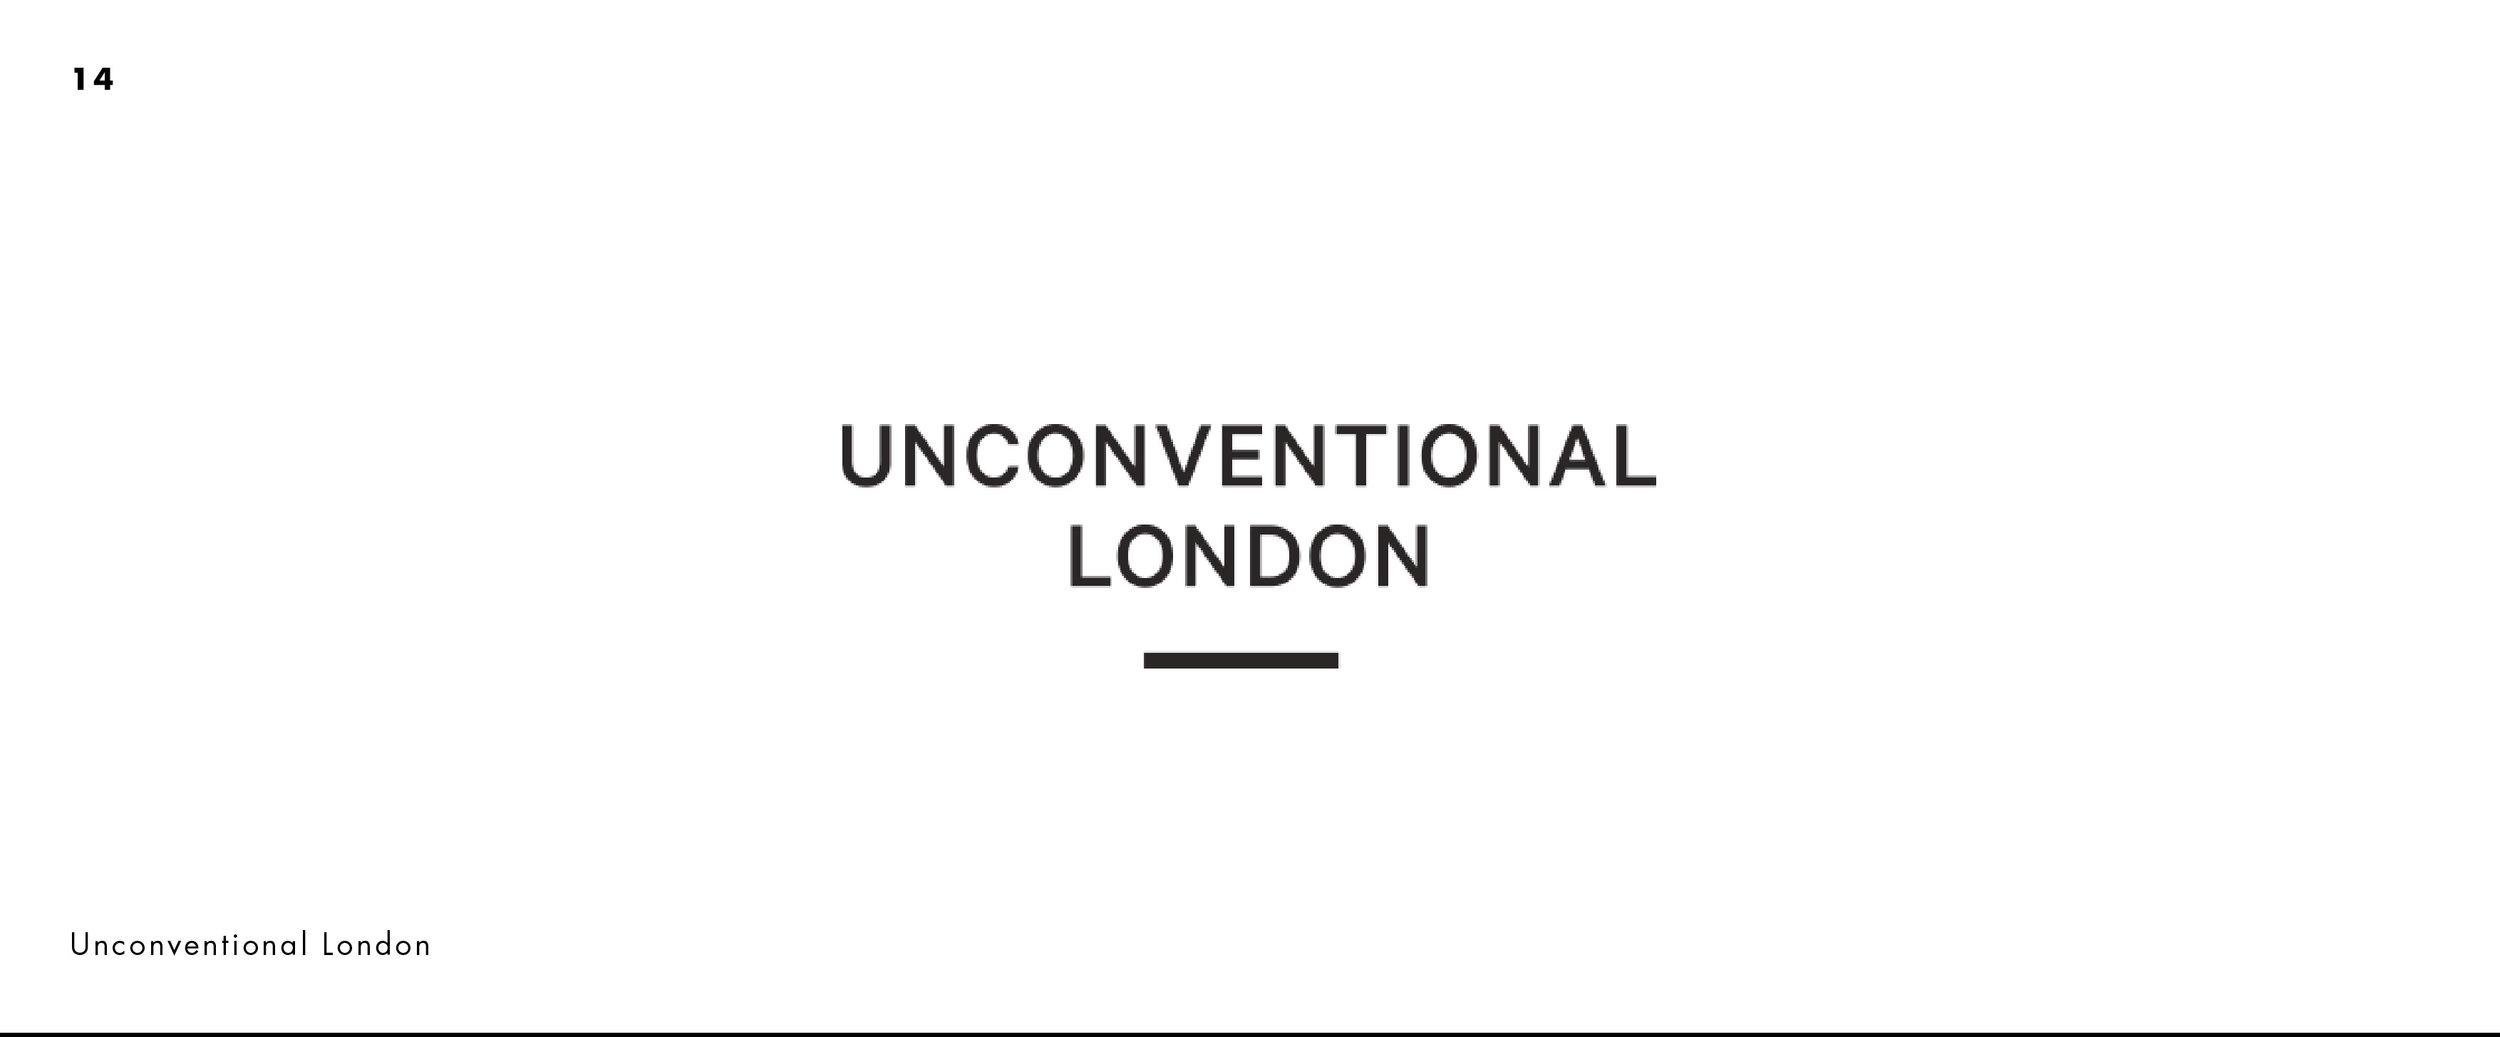 Unconventional London.jpg